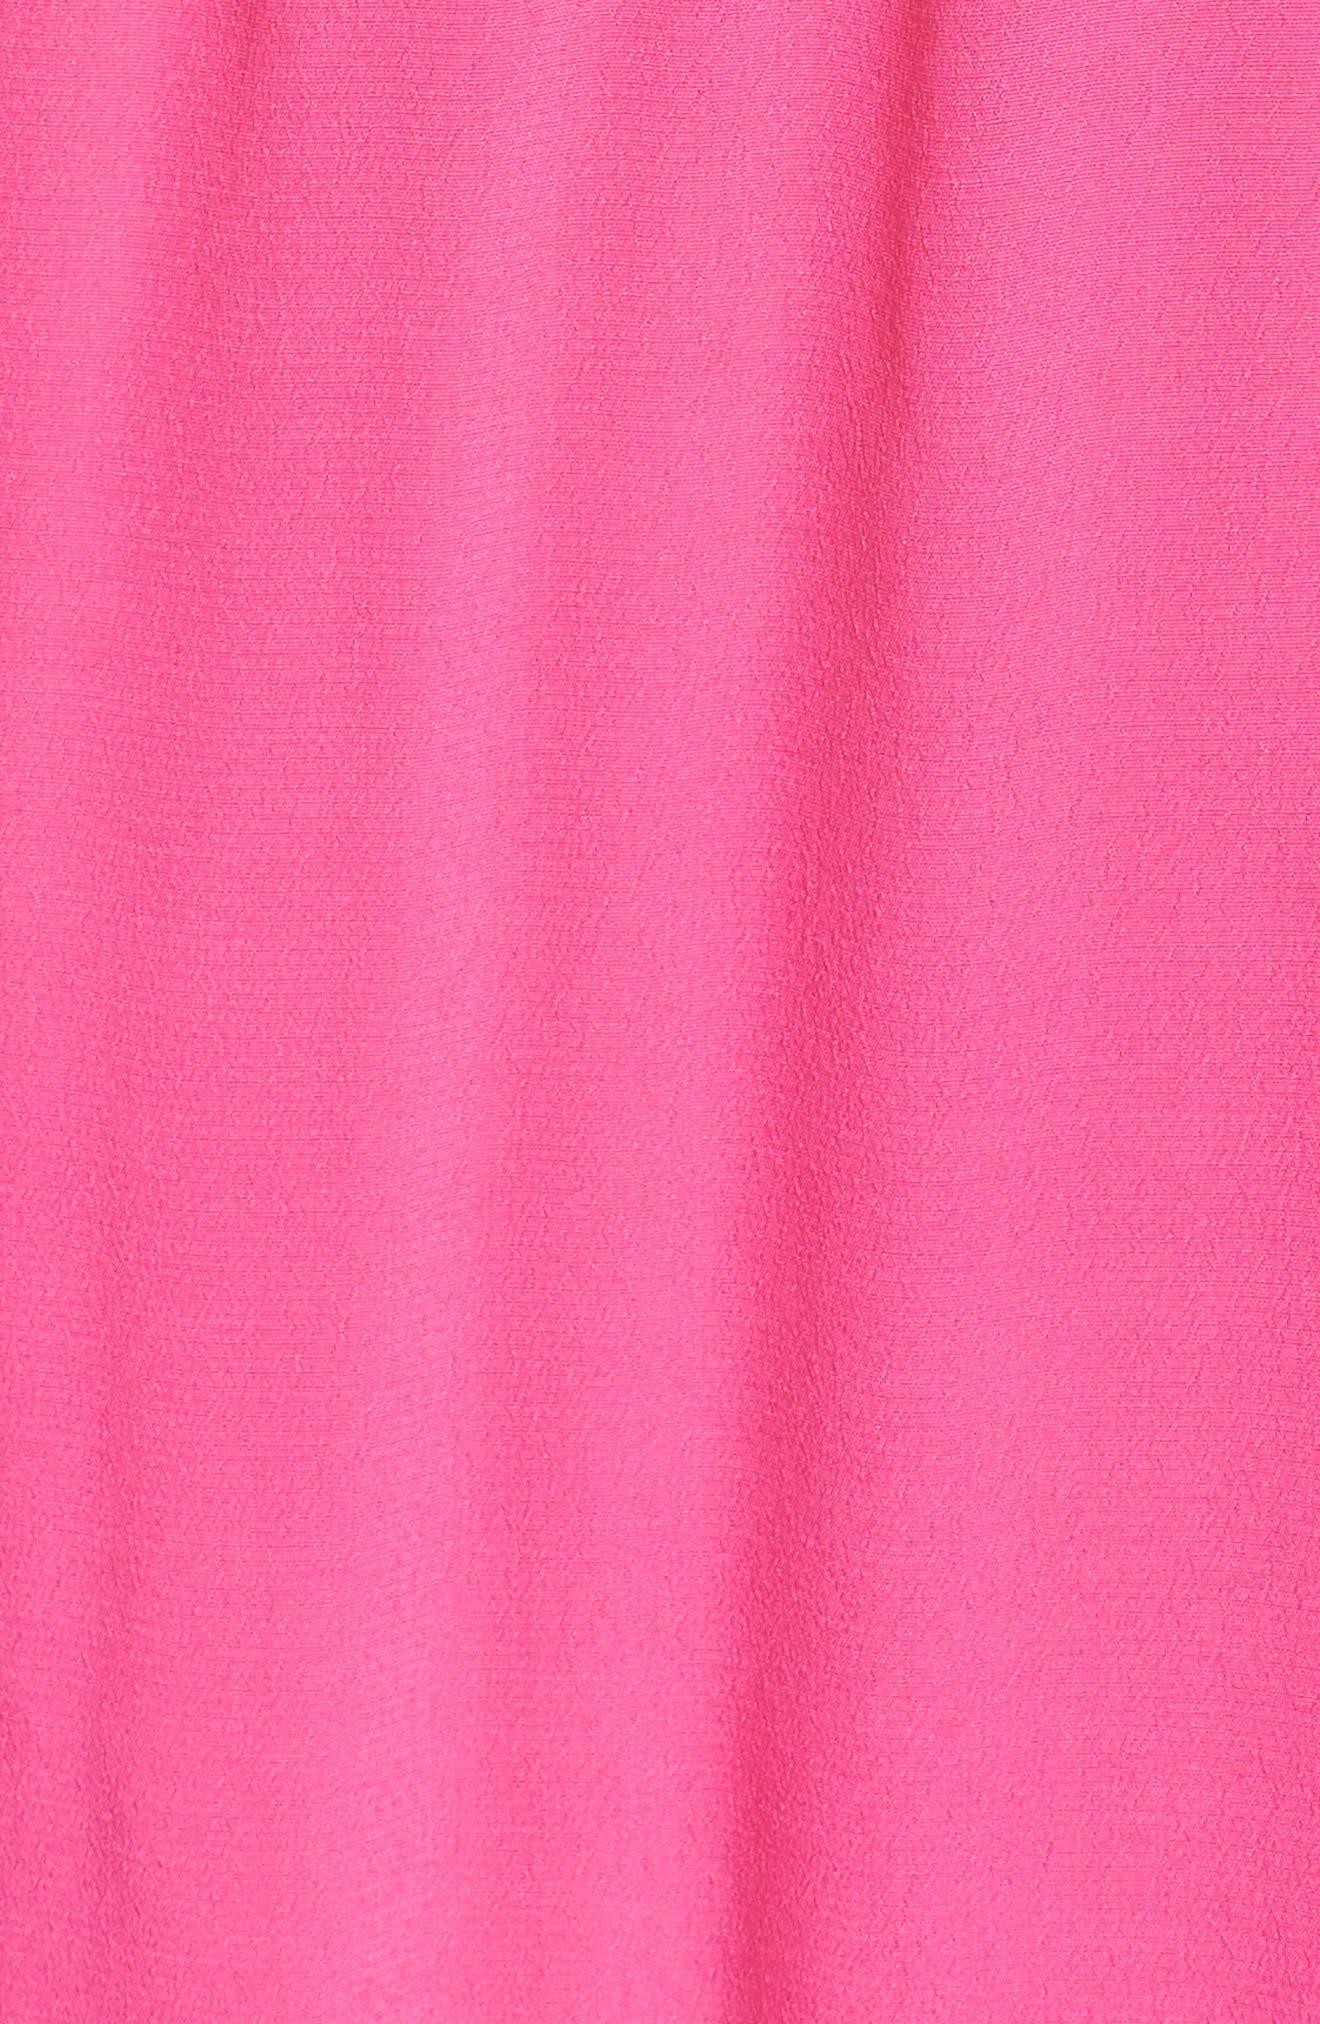 Cold Shoulder Maxi Dress,                             Alternate thumbnail 5, color,                             Pink